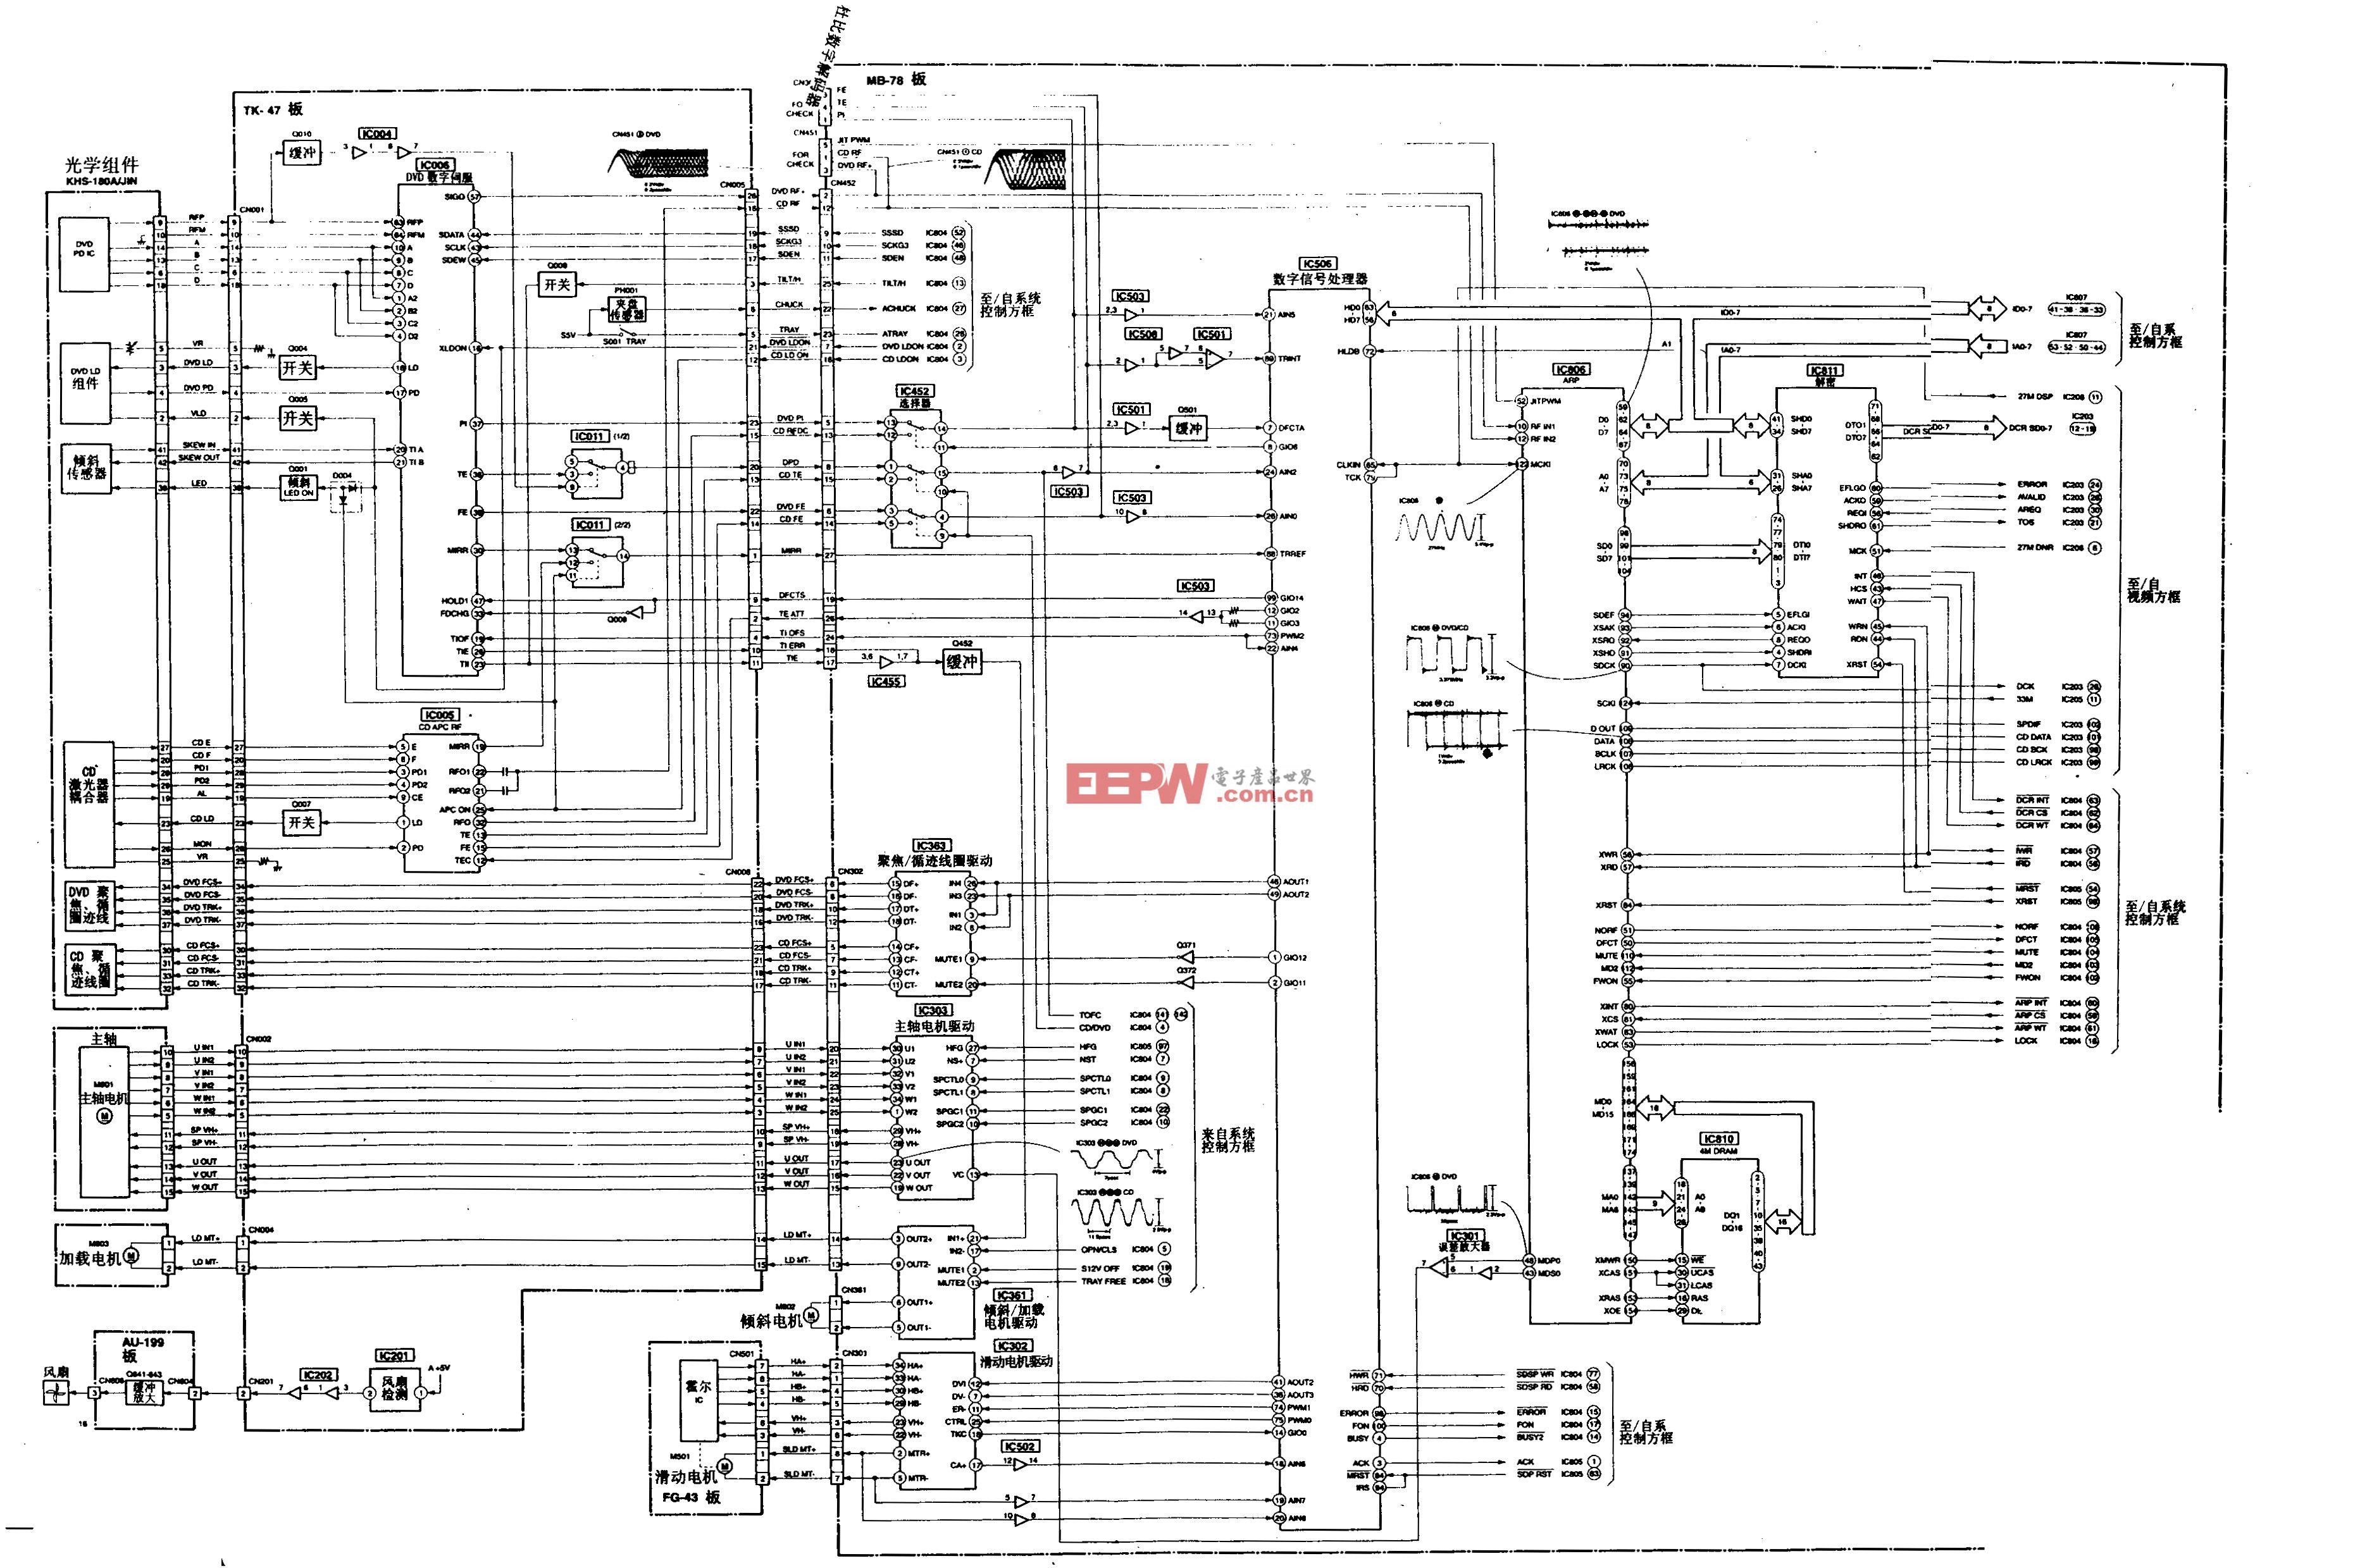 SONY DVP-M35型DVD-RF/伺服方框图